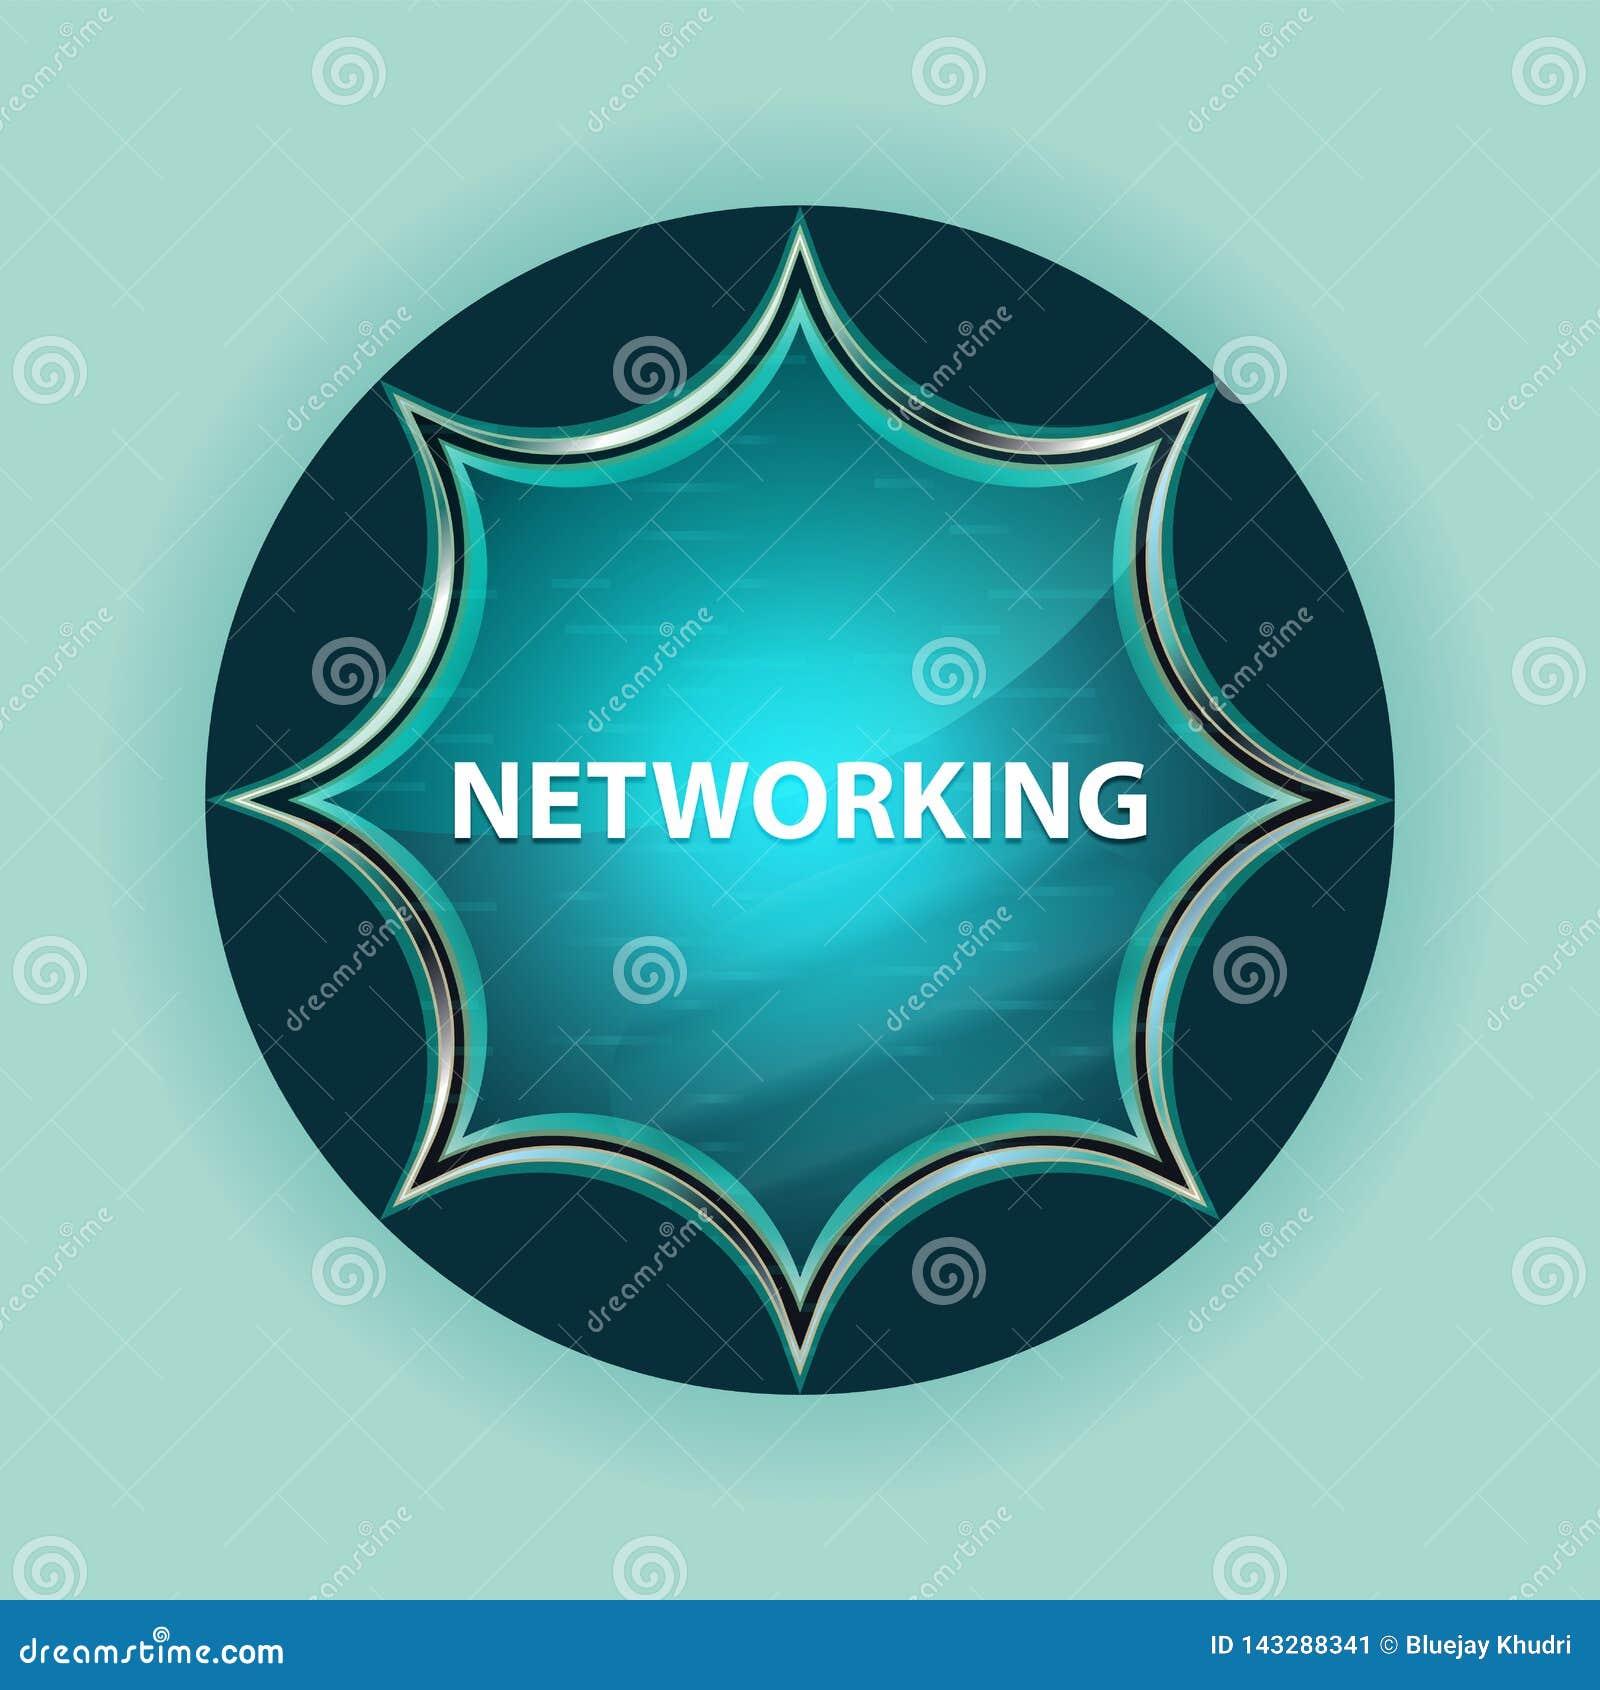 Networking magical glassy sunburst blue button sky blue background